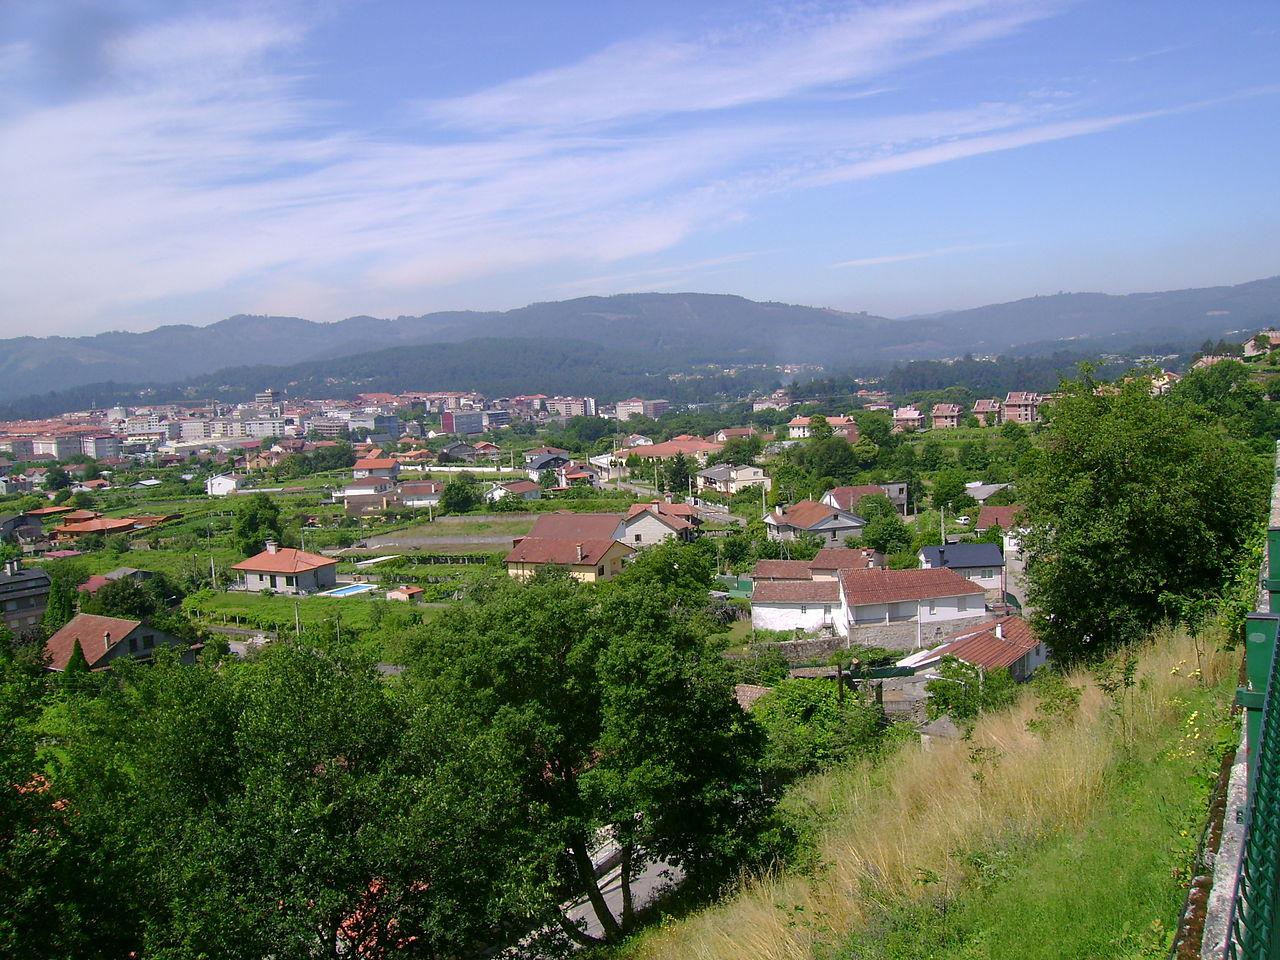 File:Vista Ponteareas.jpg - Wikipedia